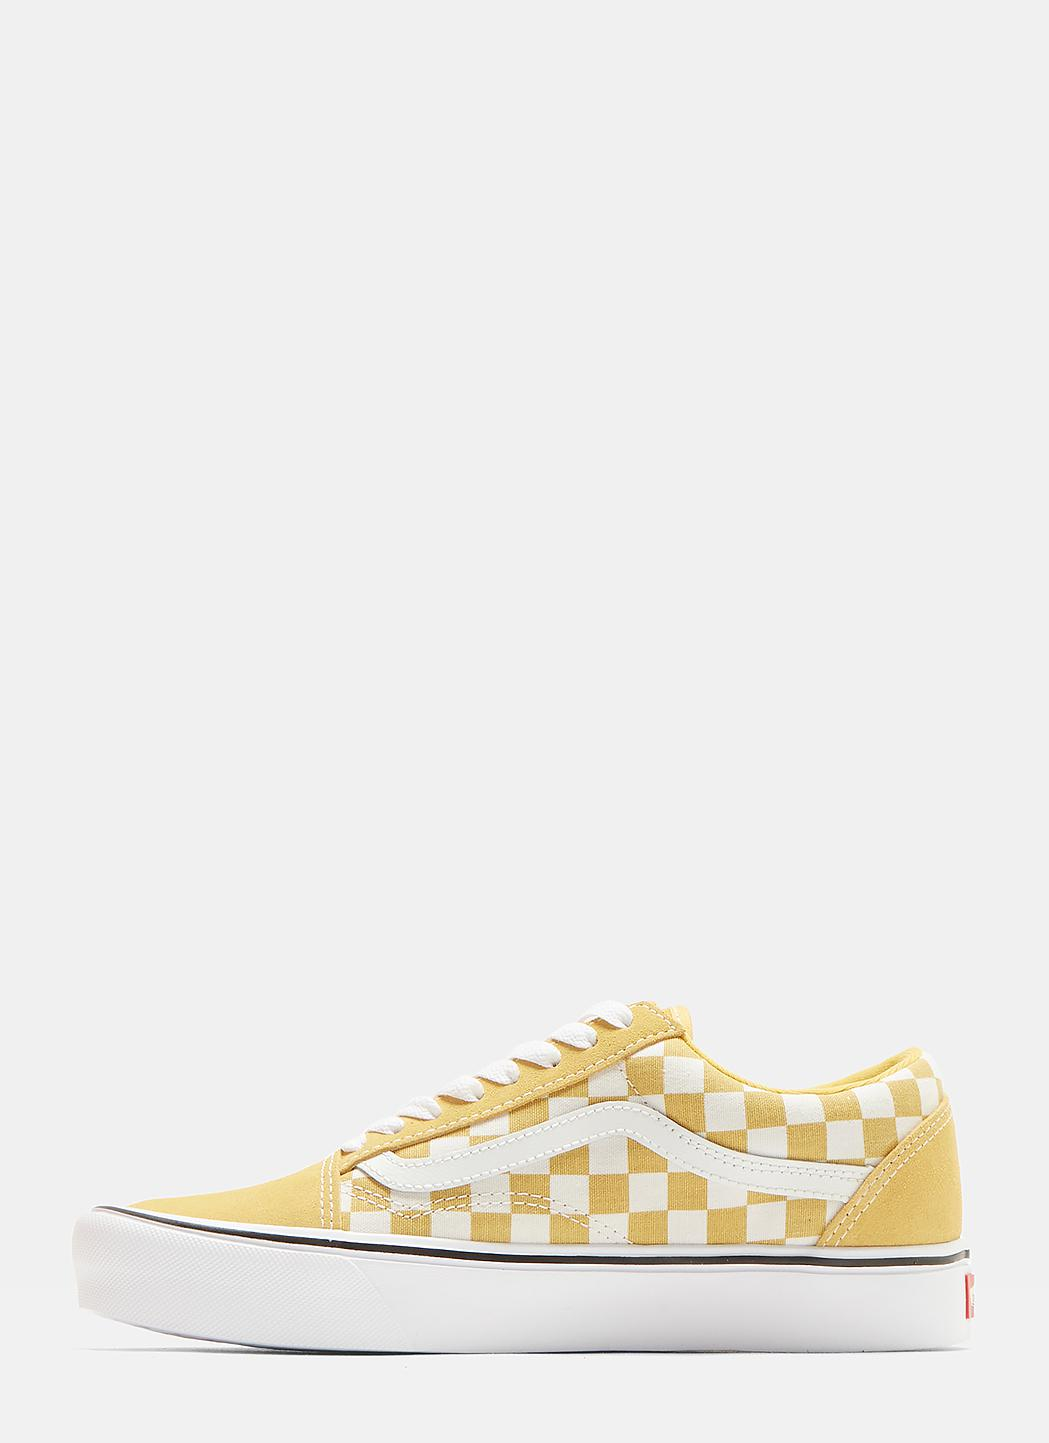 9d7fa4fcda74 Lyst - Vans Classic Old Skool Checkerboard Sneakers In Yellow in Yellow